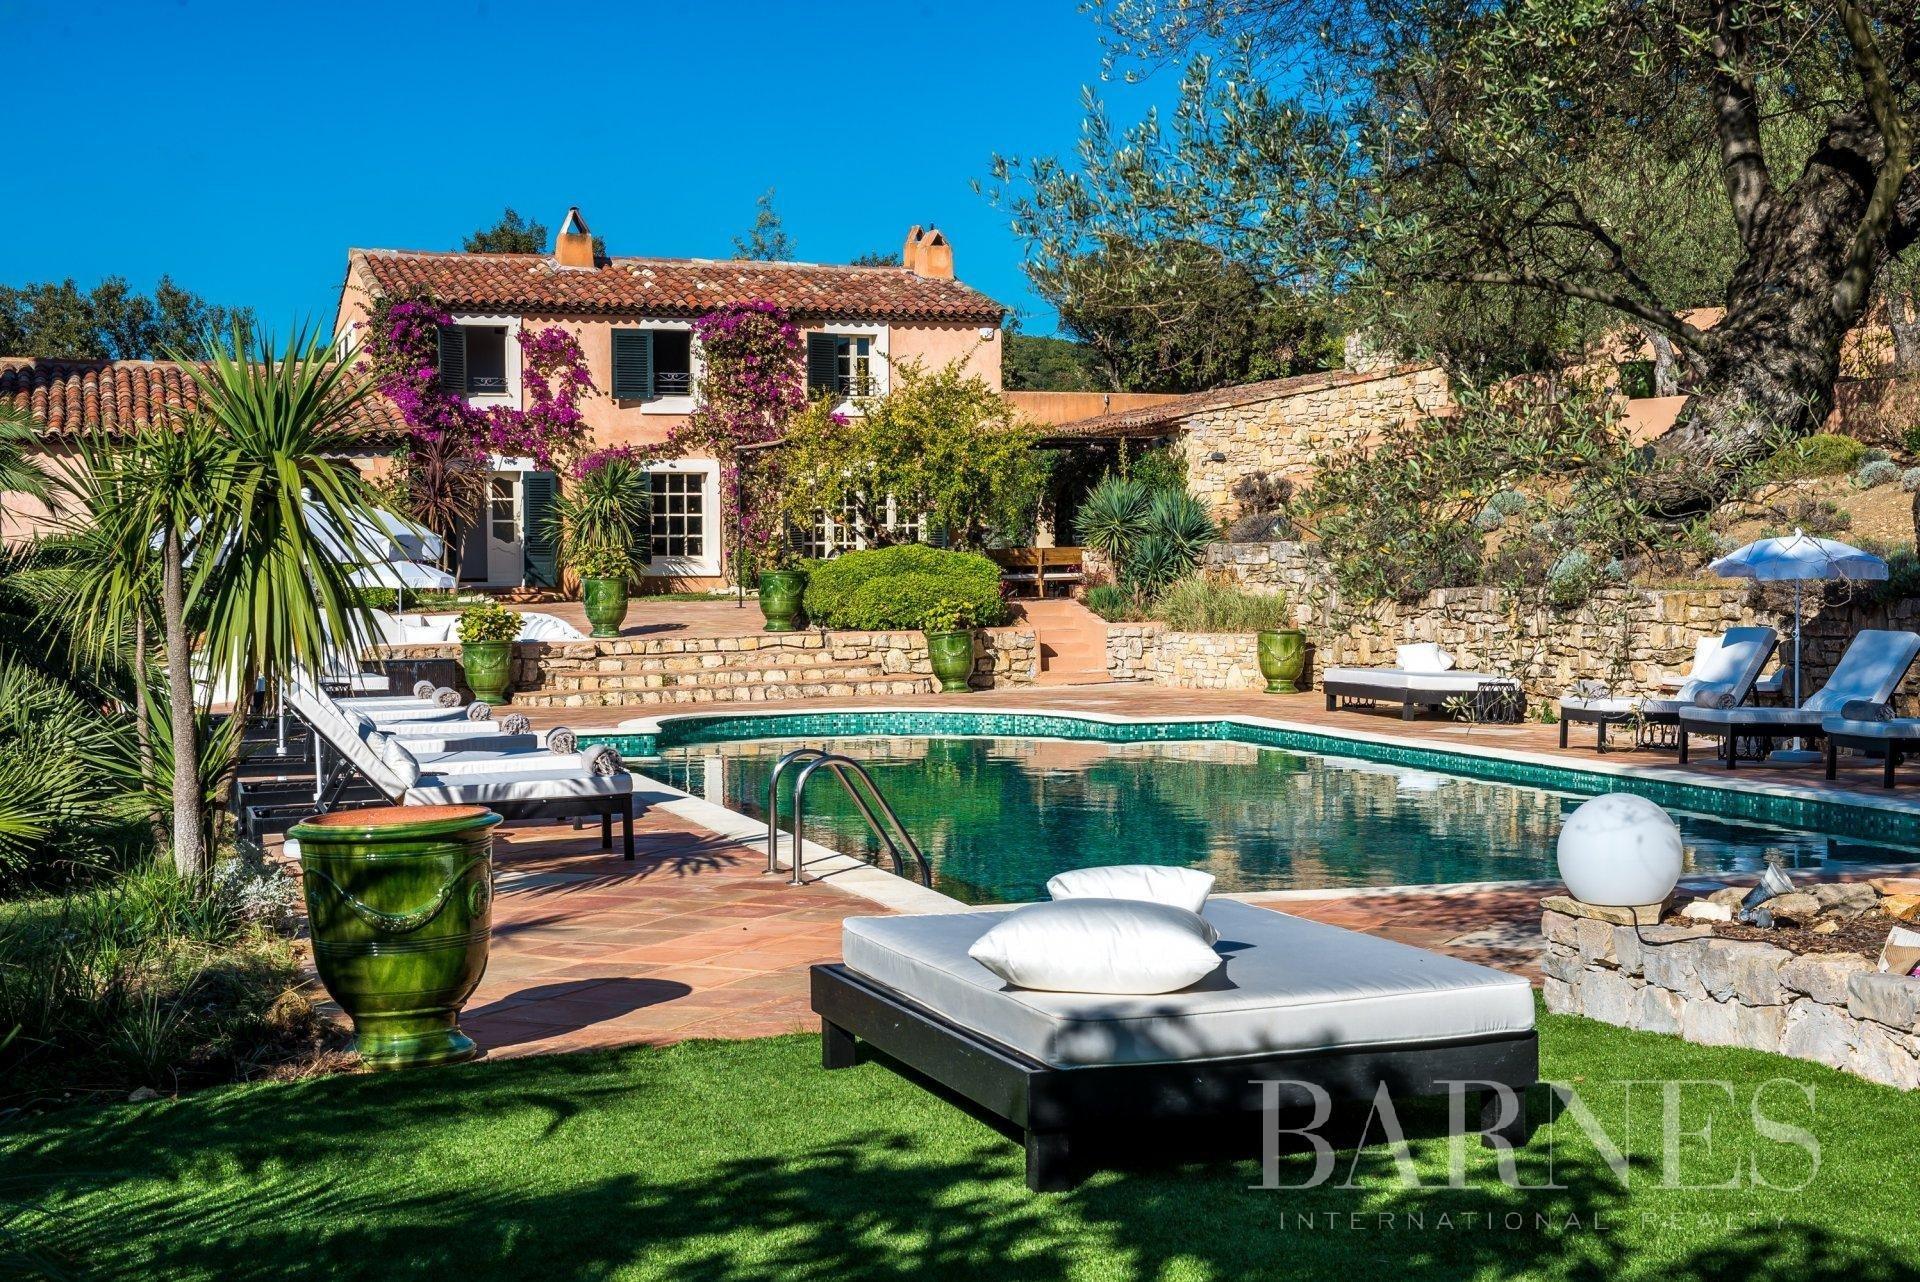 Villa in La Croix-Valmer, Provence-Alpes-Côte d'Azur, France 1